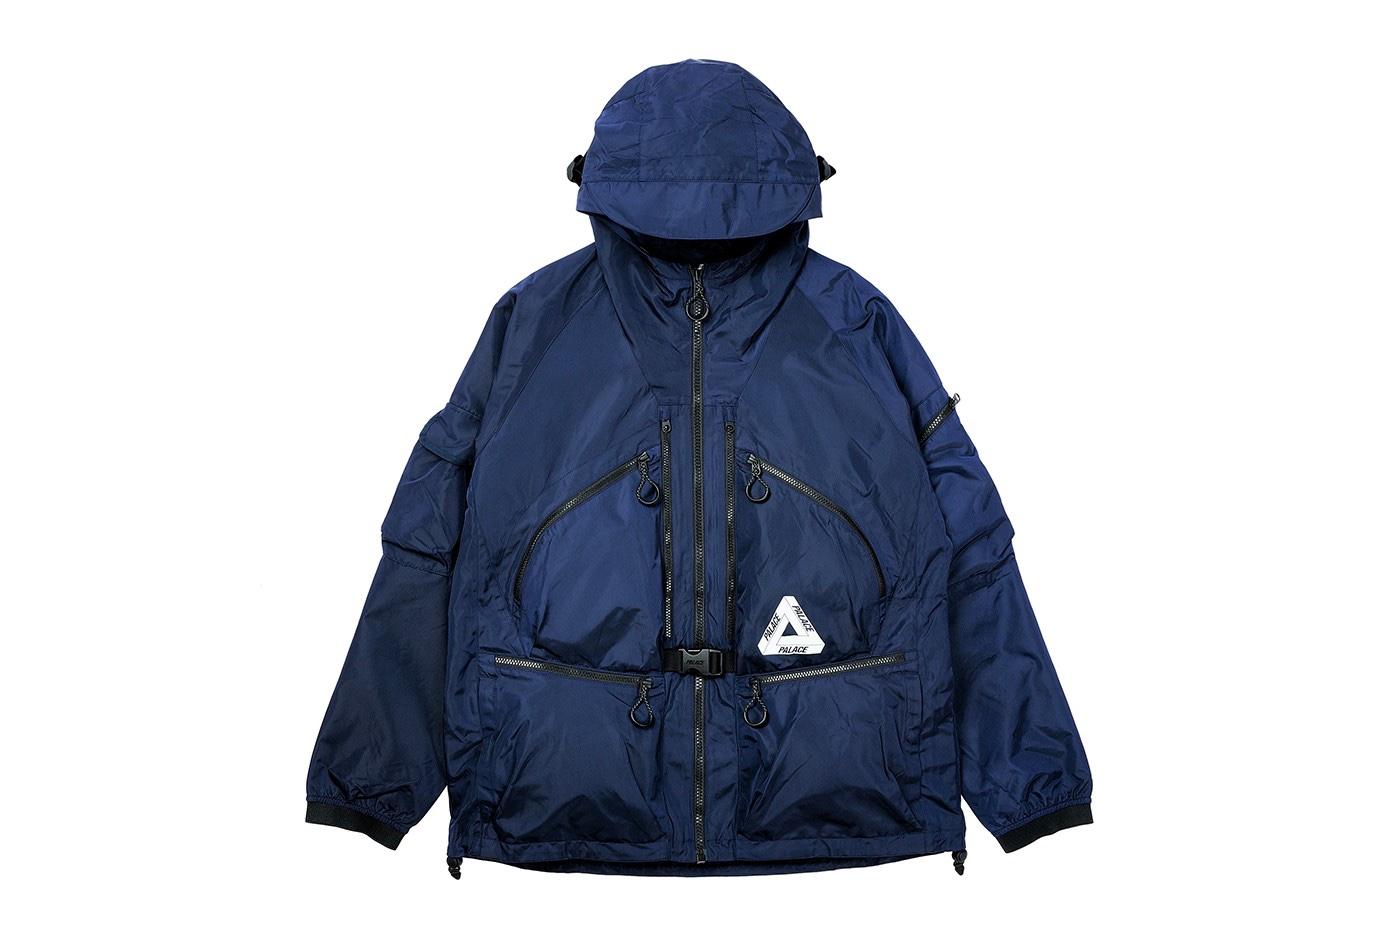 Palace Ballistic Jacket